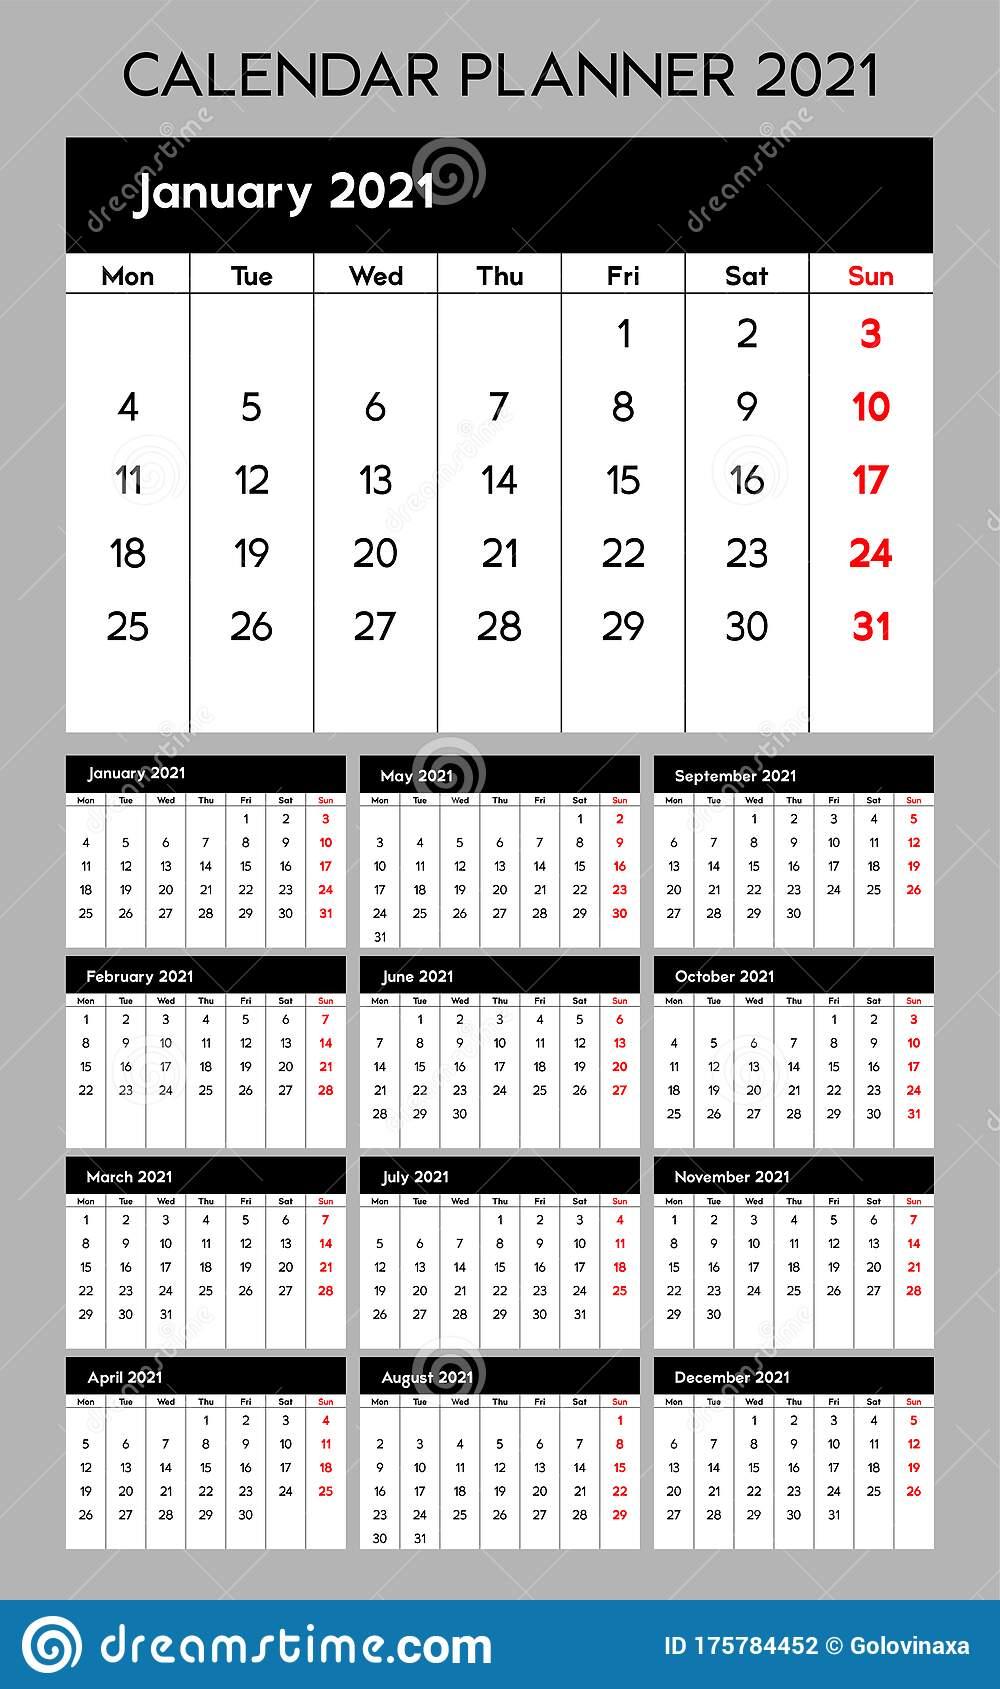 Calendar Planner 2021, Base Template Design. Week Starts